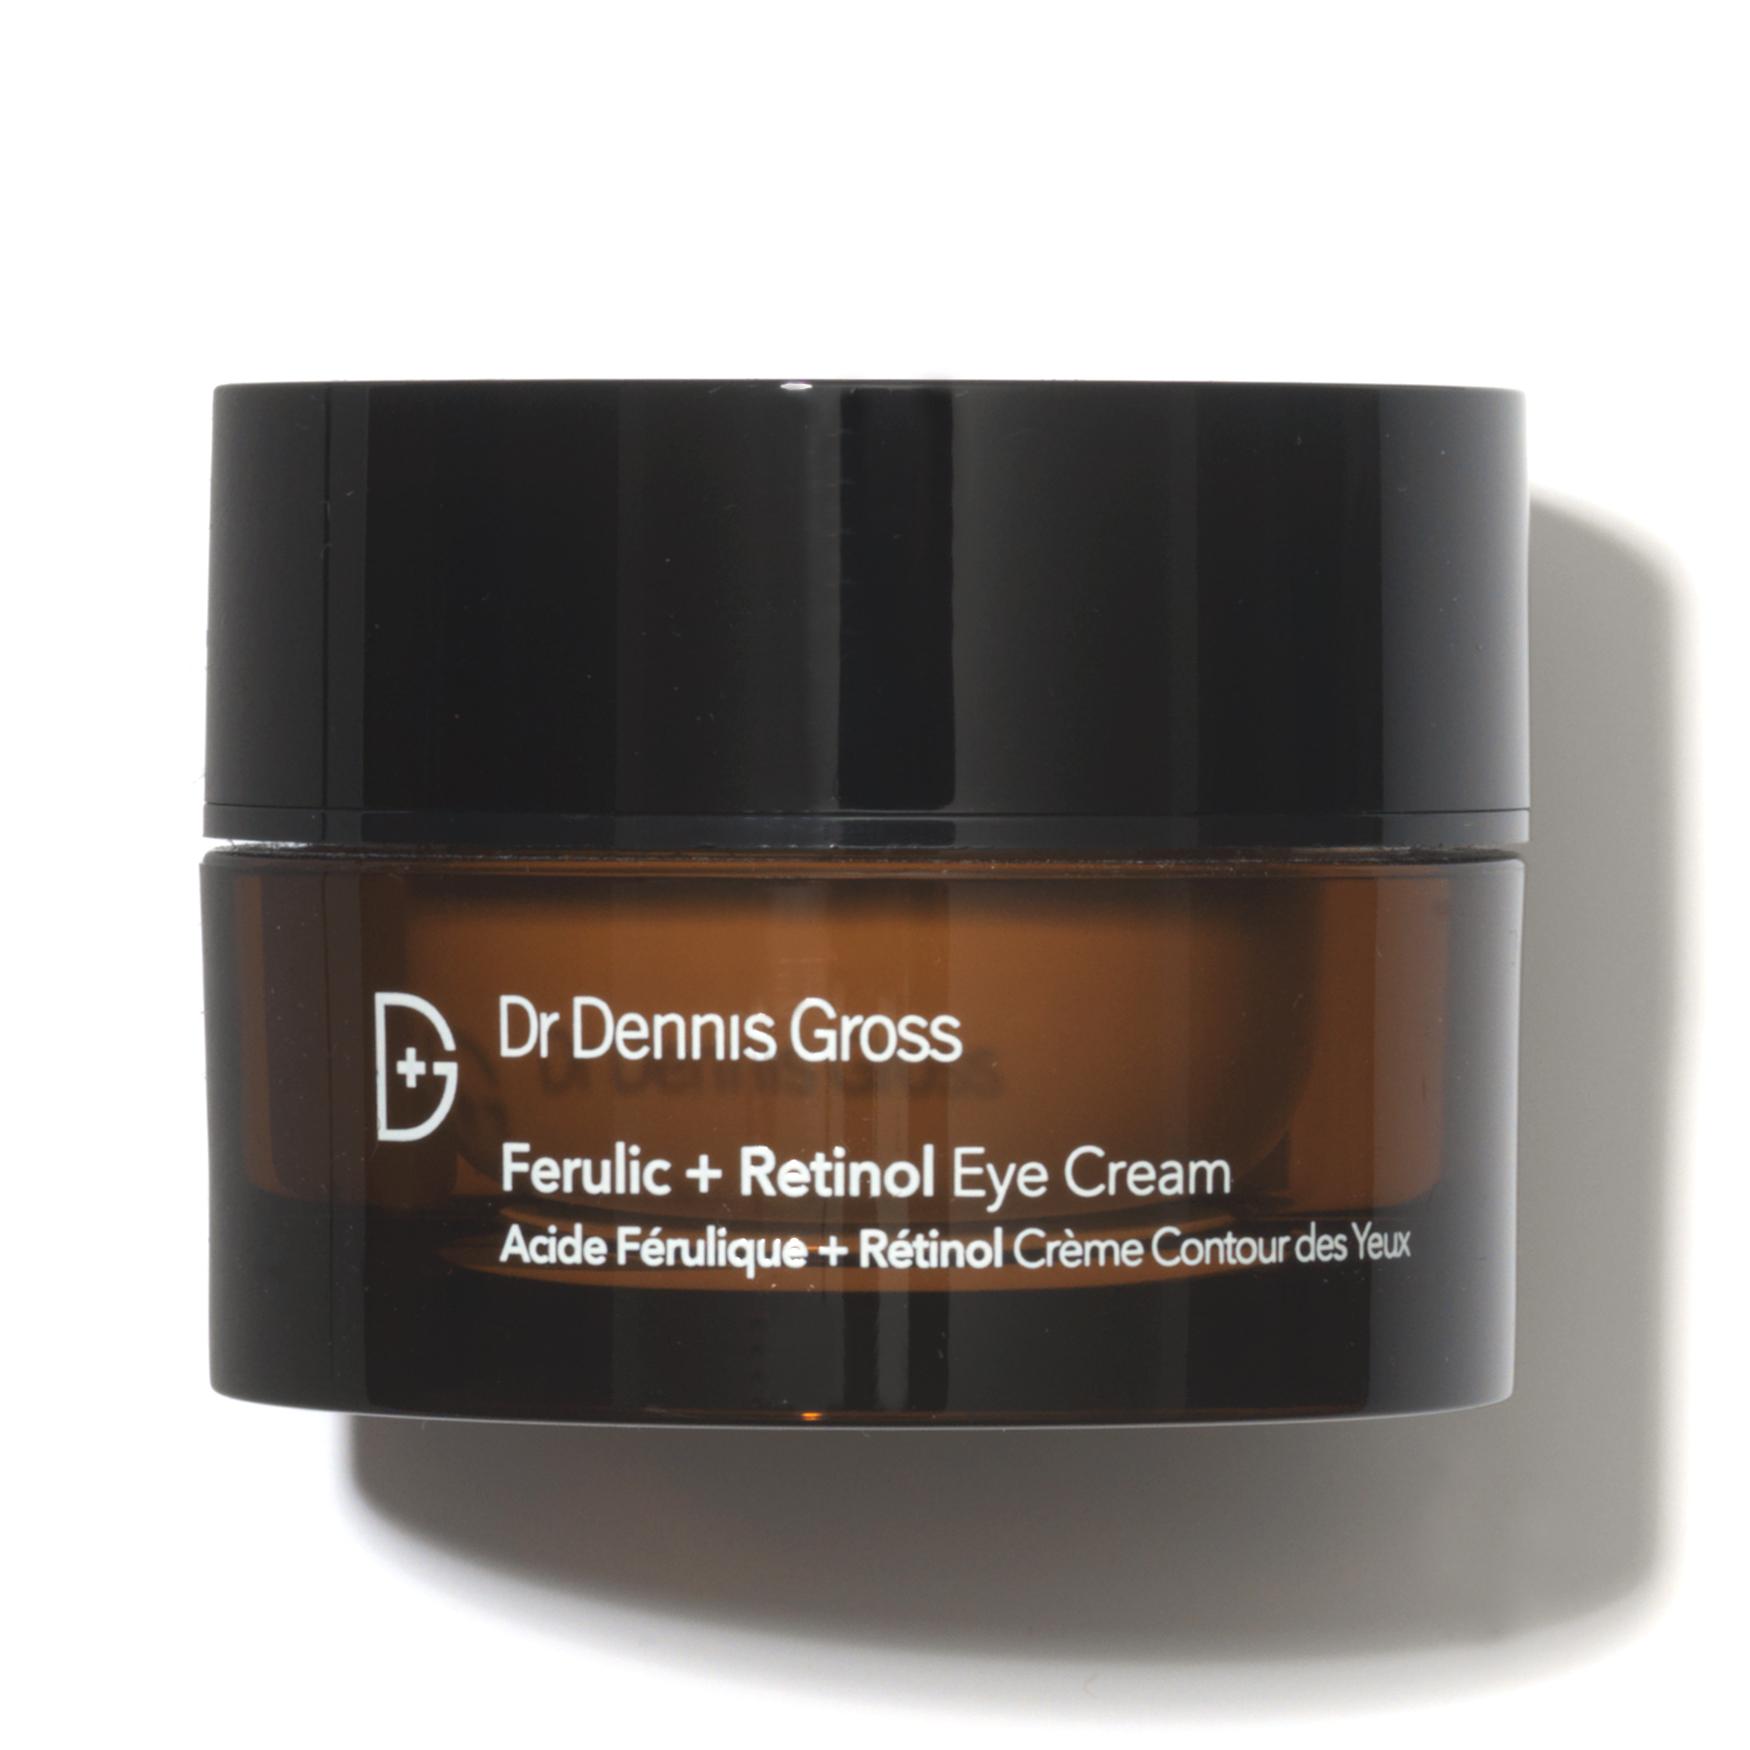 Dr Dennis Gross Ferulic Retinol Eye Cream Space Nk